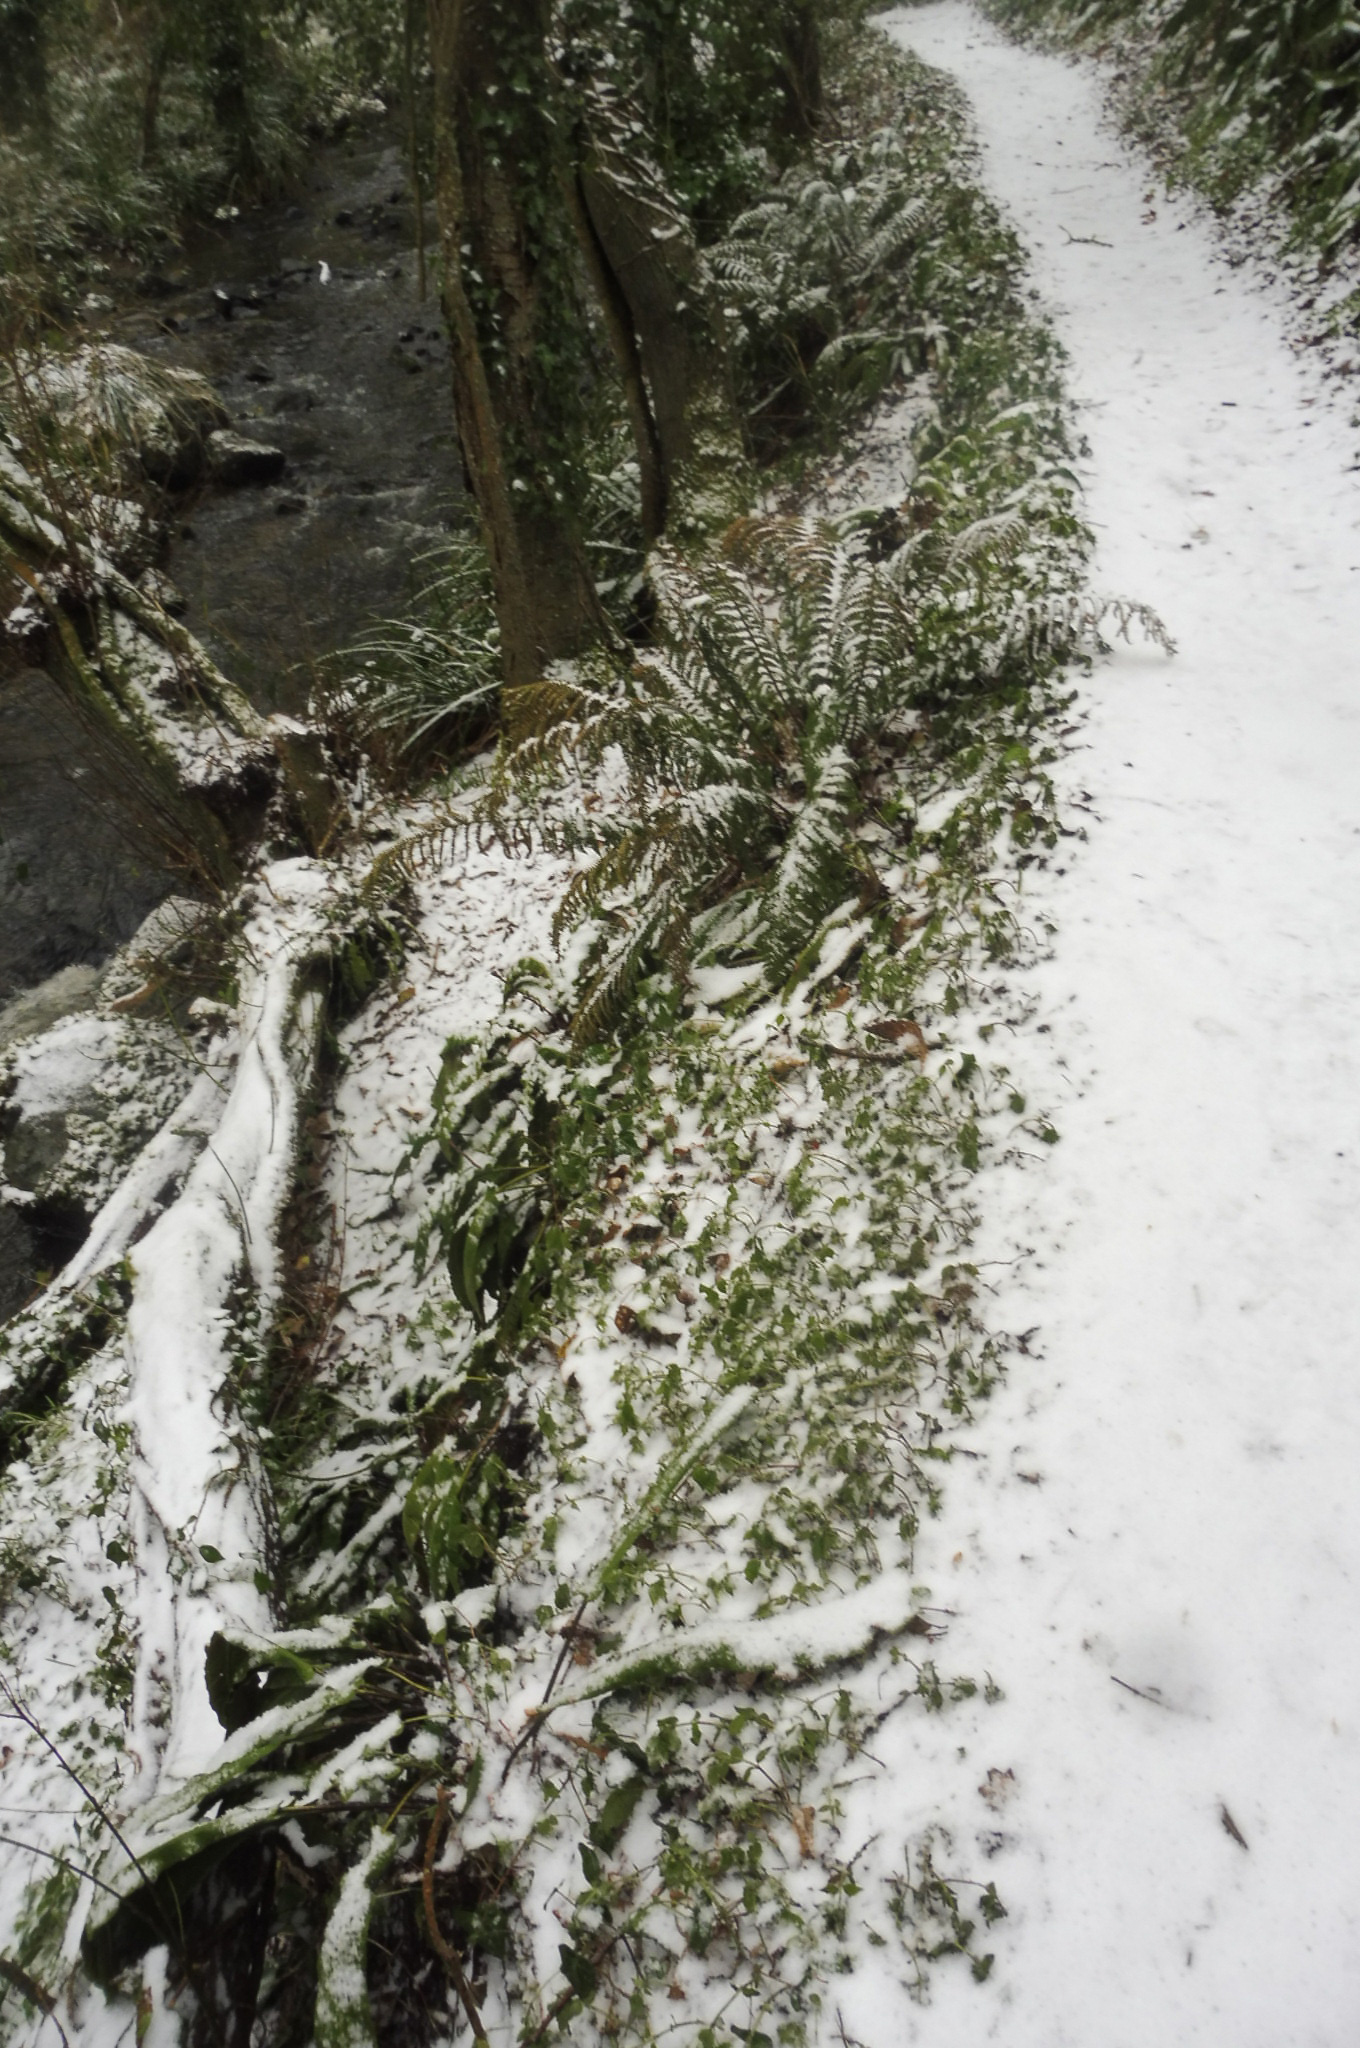 Gel et neige flora 01 03 2018 019pm.jpg